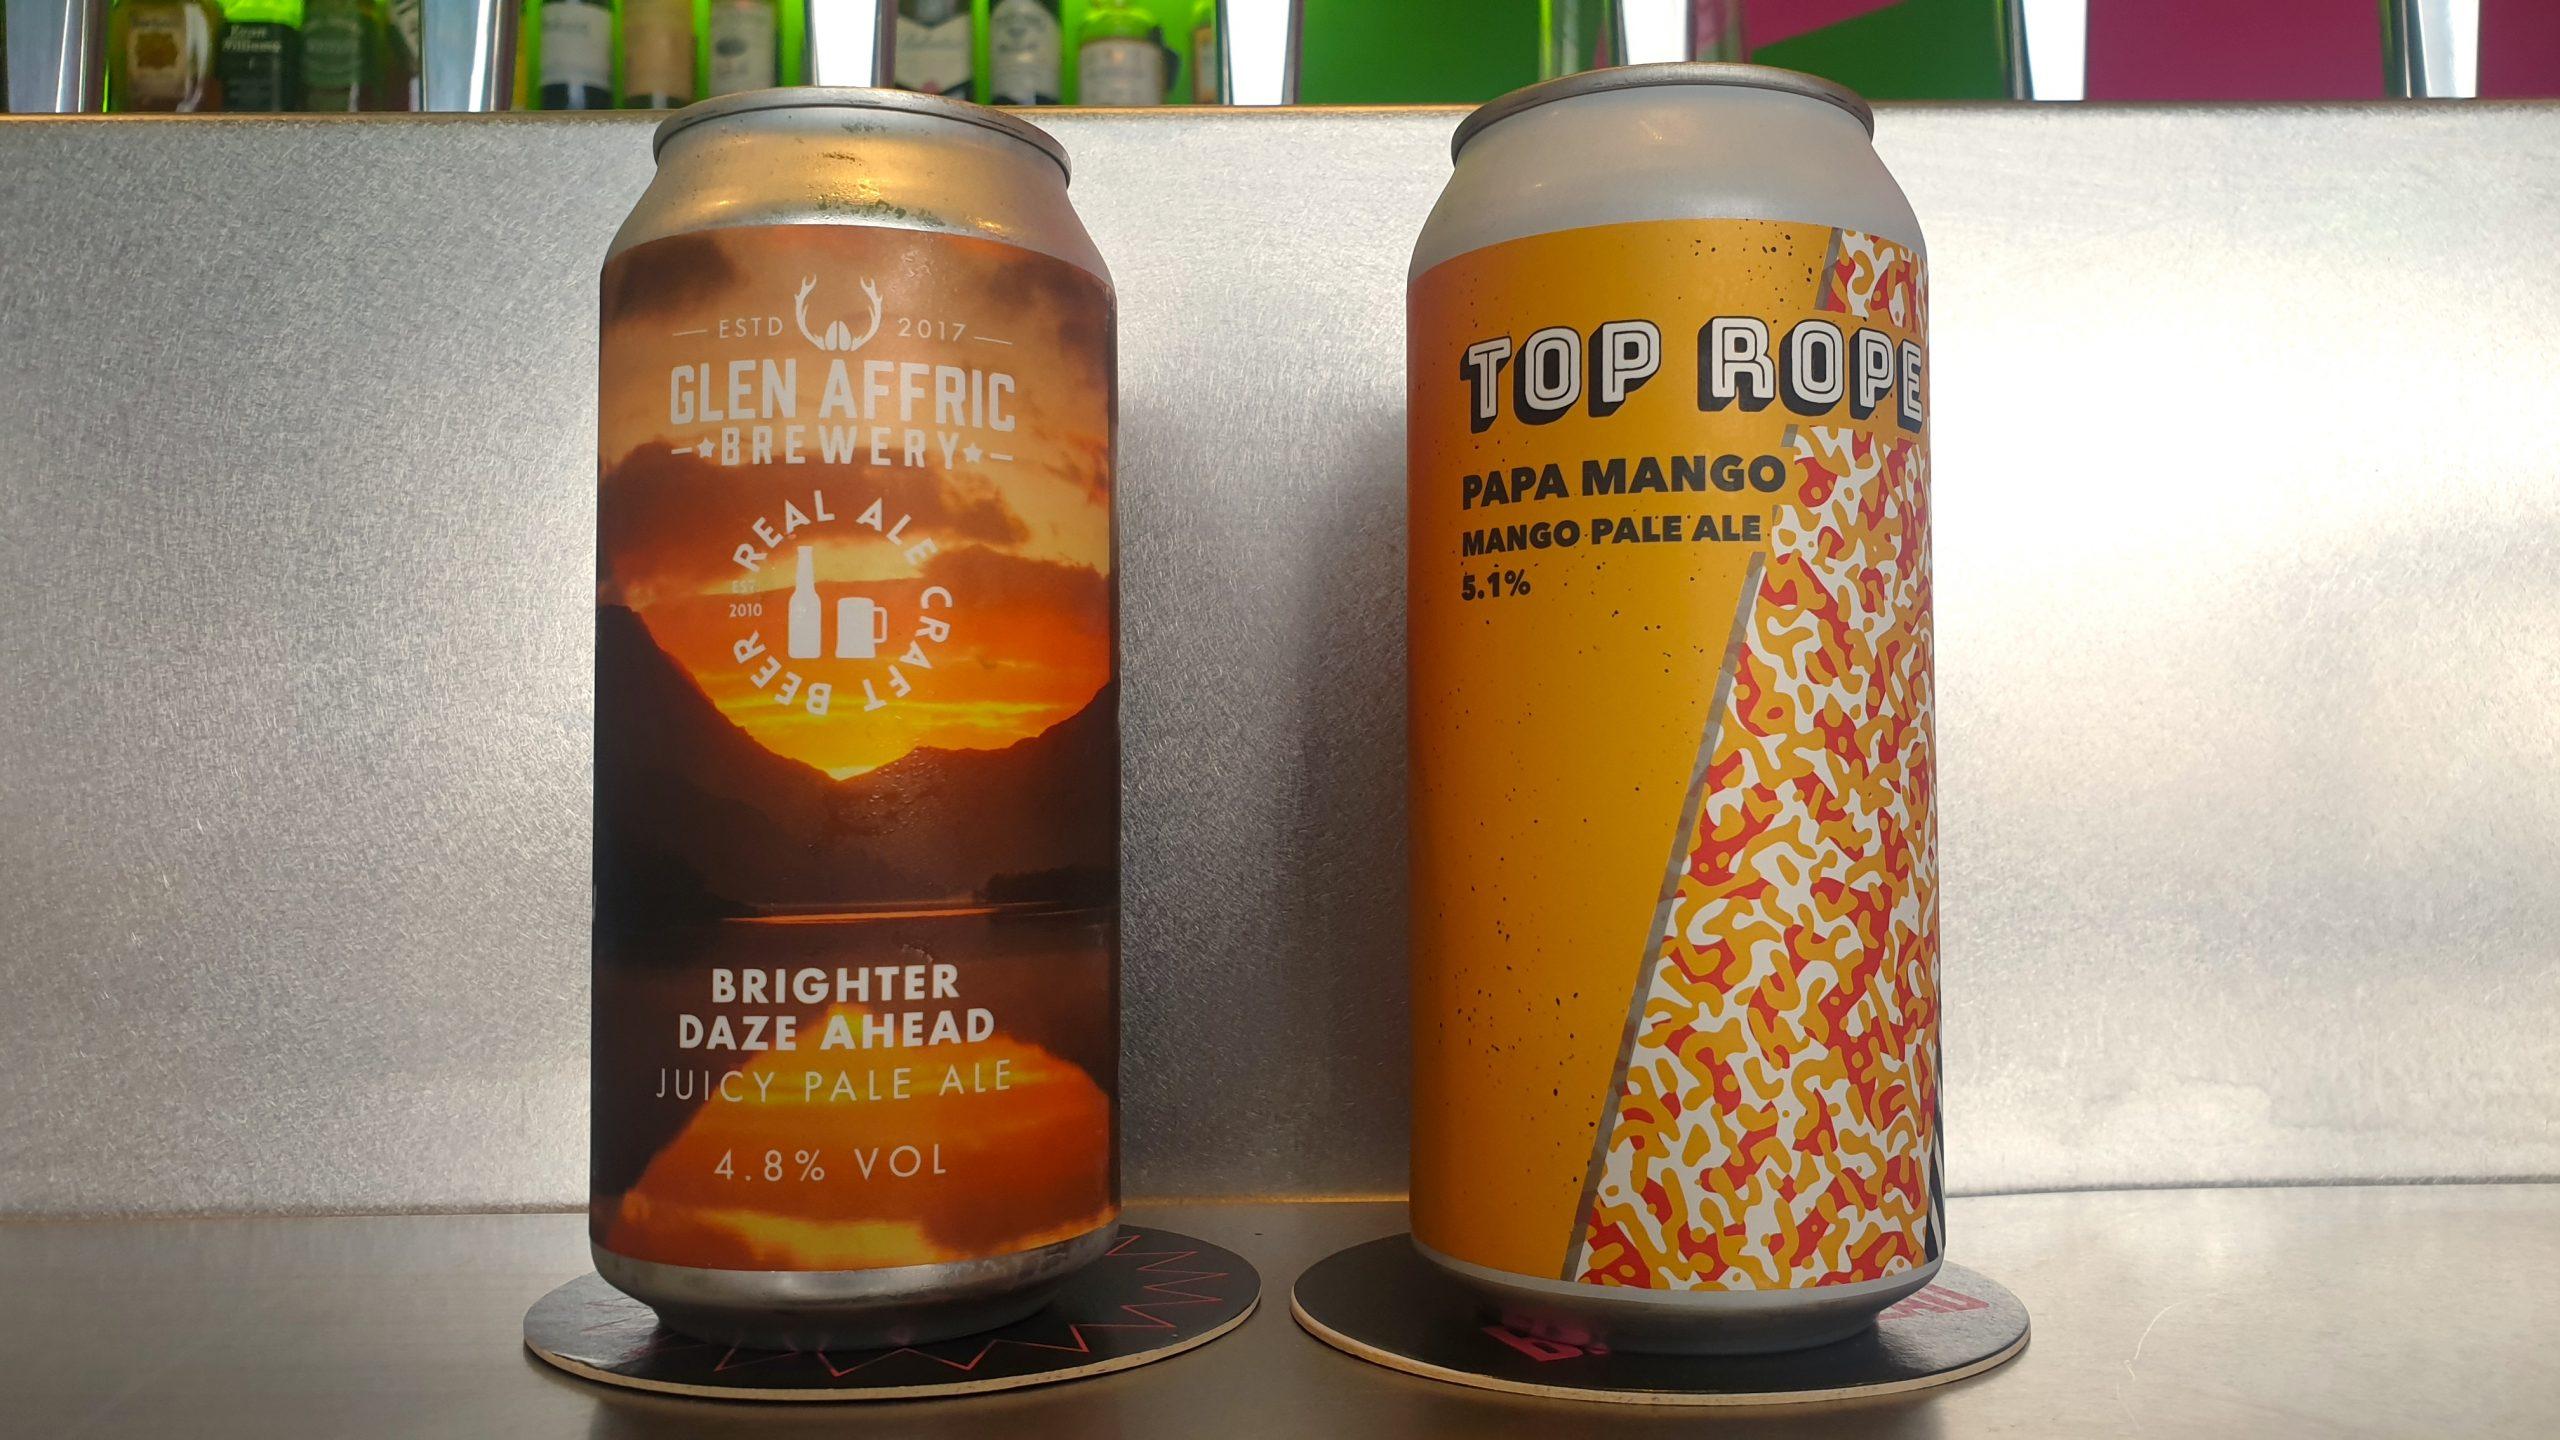 Glen Affric Top Rope beer tasting at Future Yard